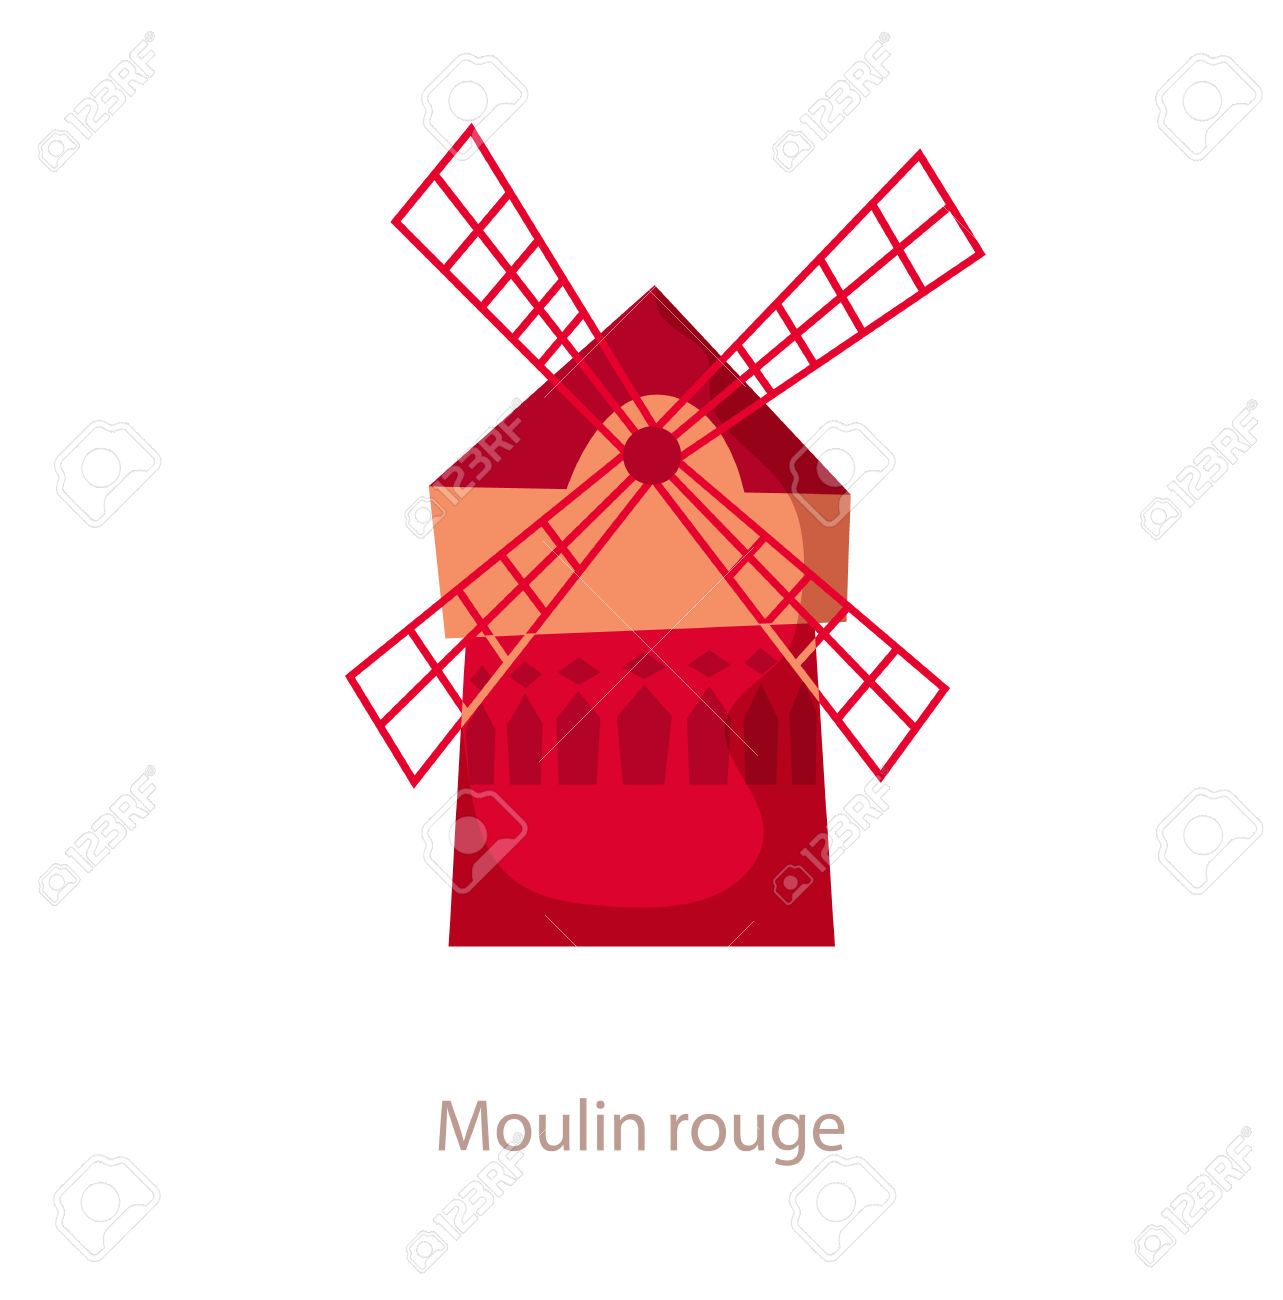 Moulin Rouge. Paris Landmark. Travel Flat Illustration. France.